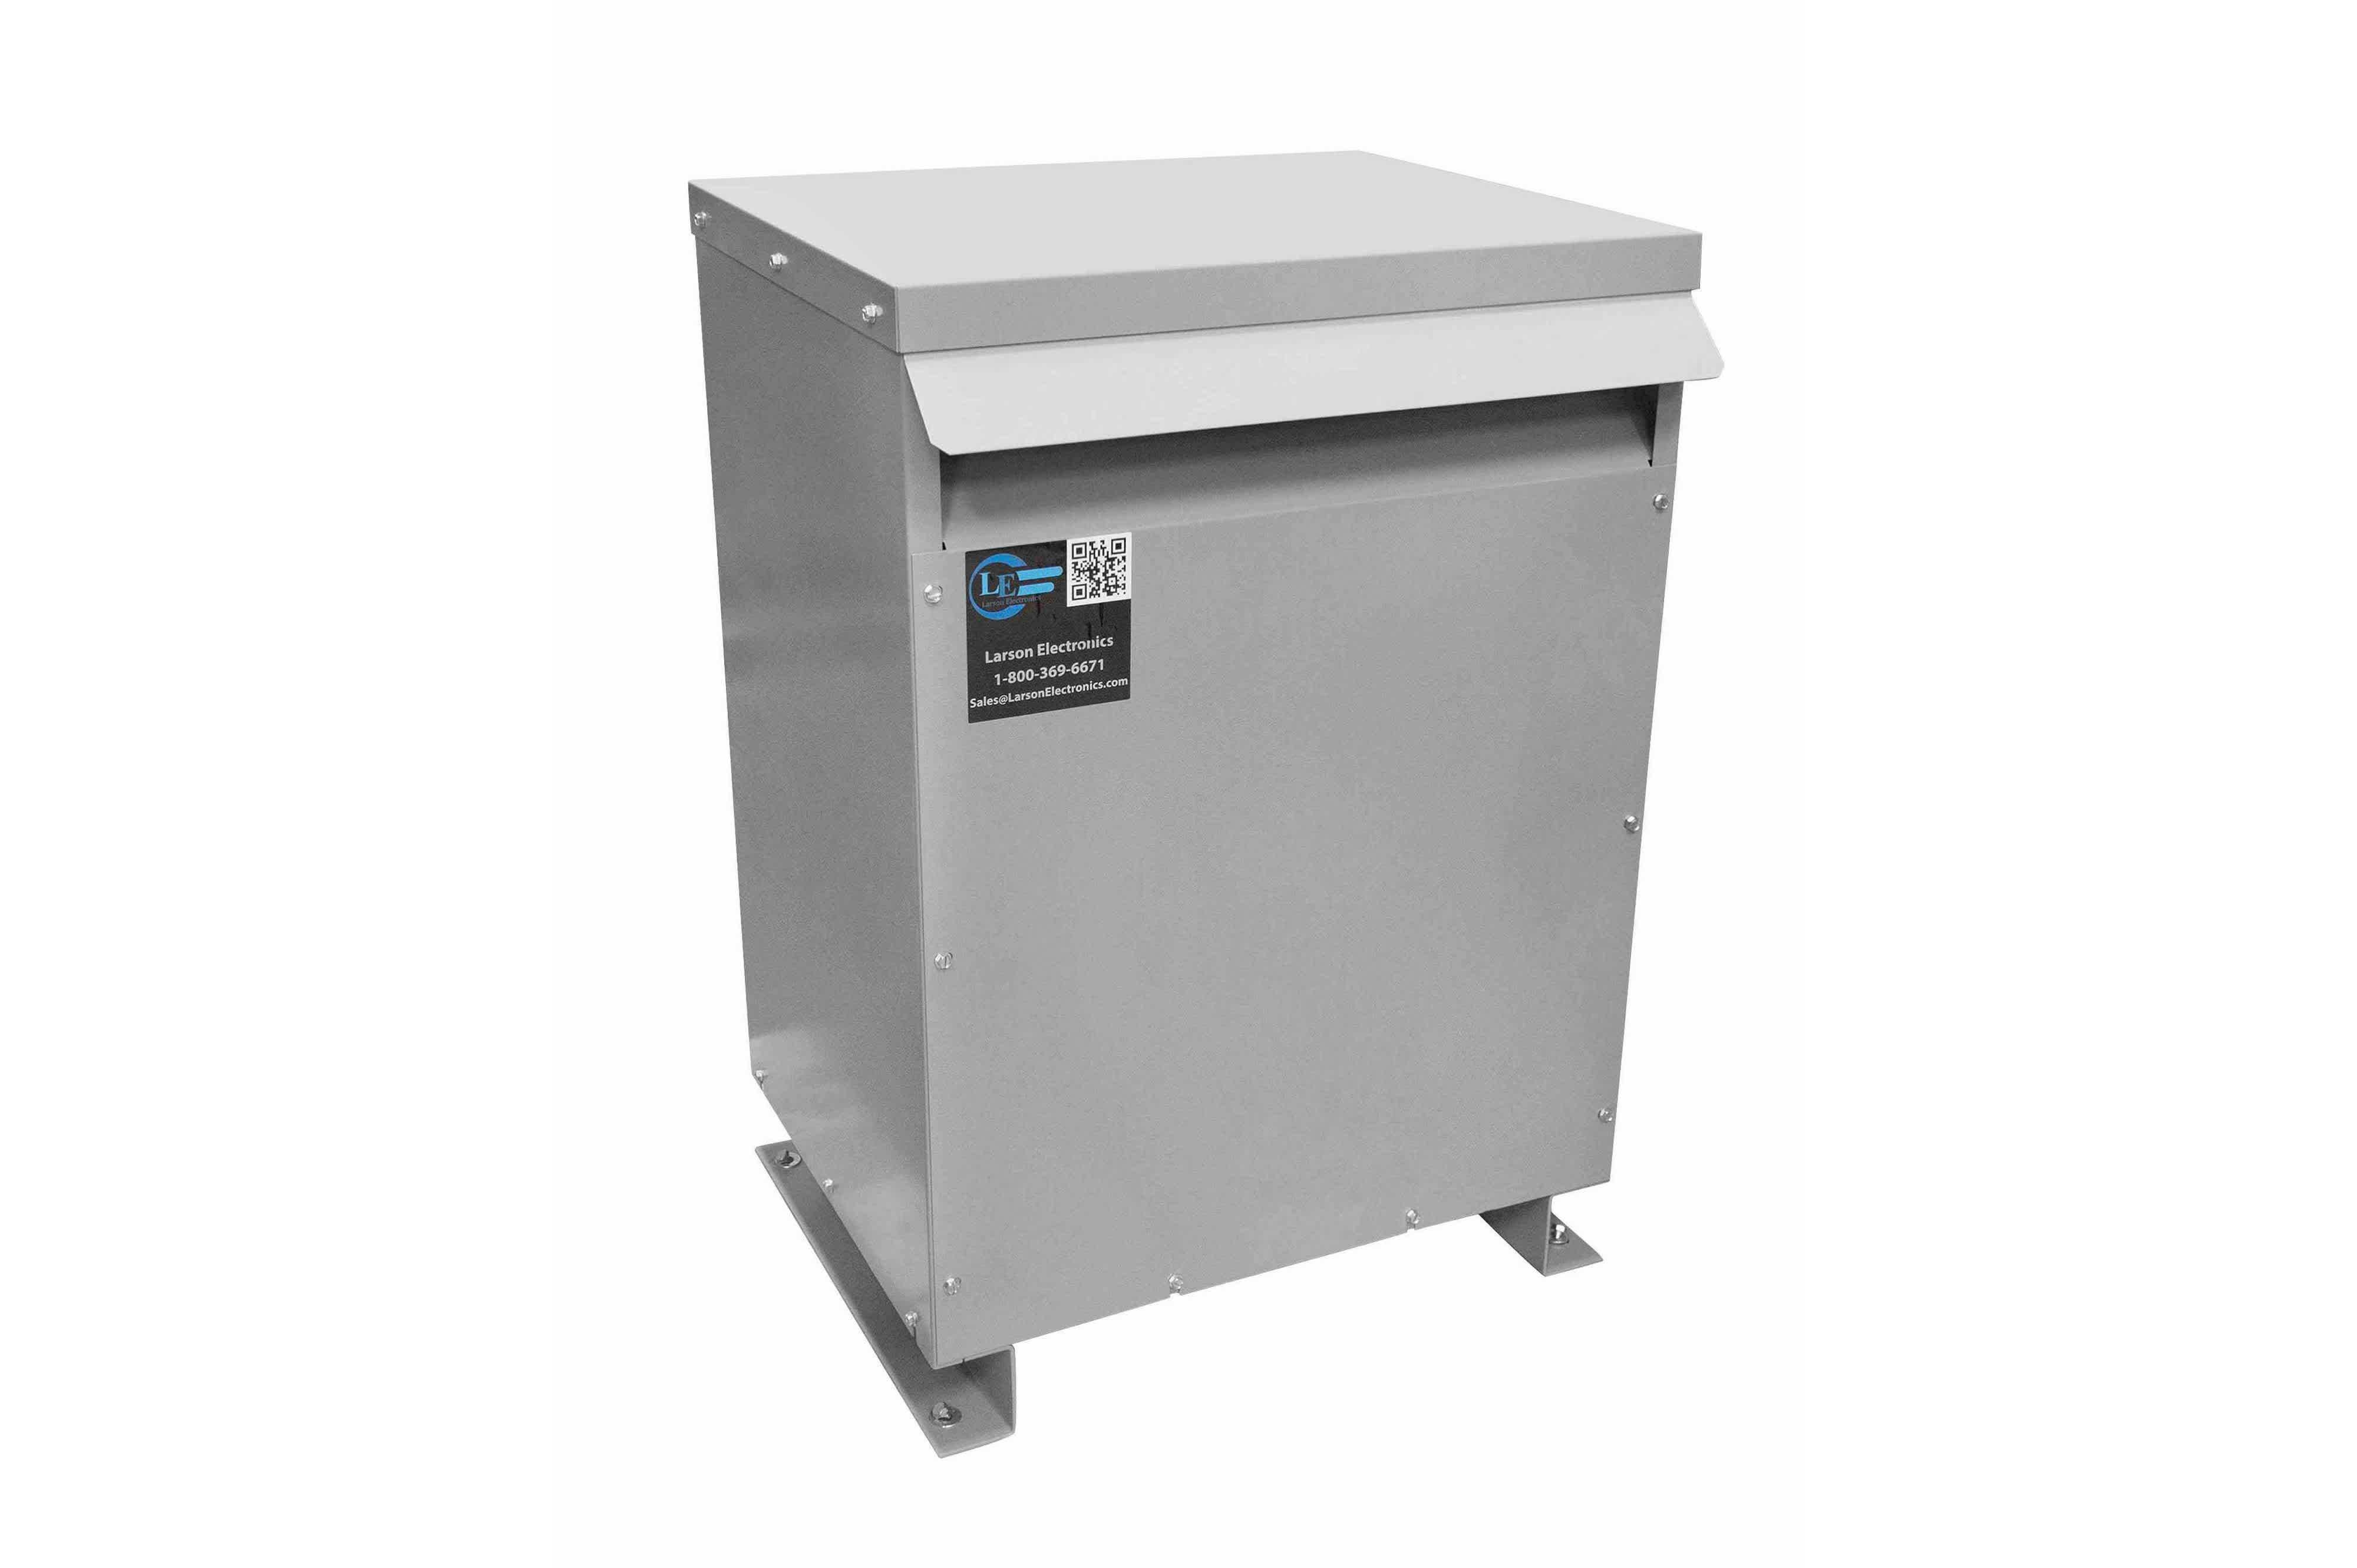 11 kVA 3PH Isolation Transformer, 400V Wye Primary, 208Y/120 Wye-N Secondary, N3R, Ventilated, 60 Hz